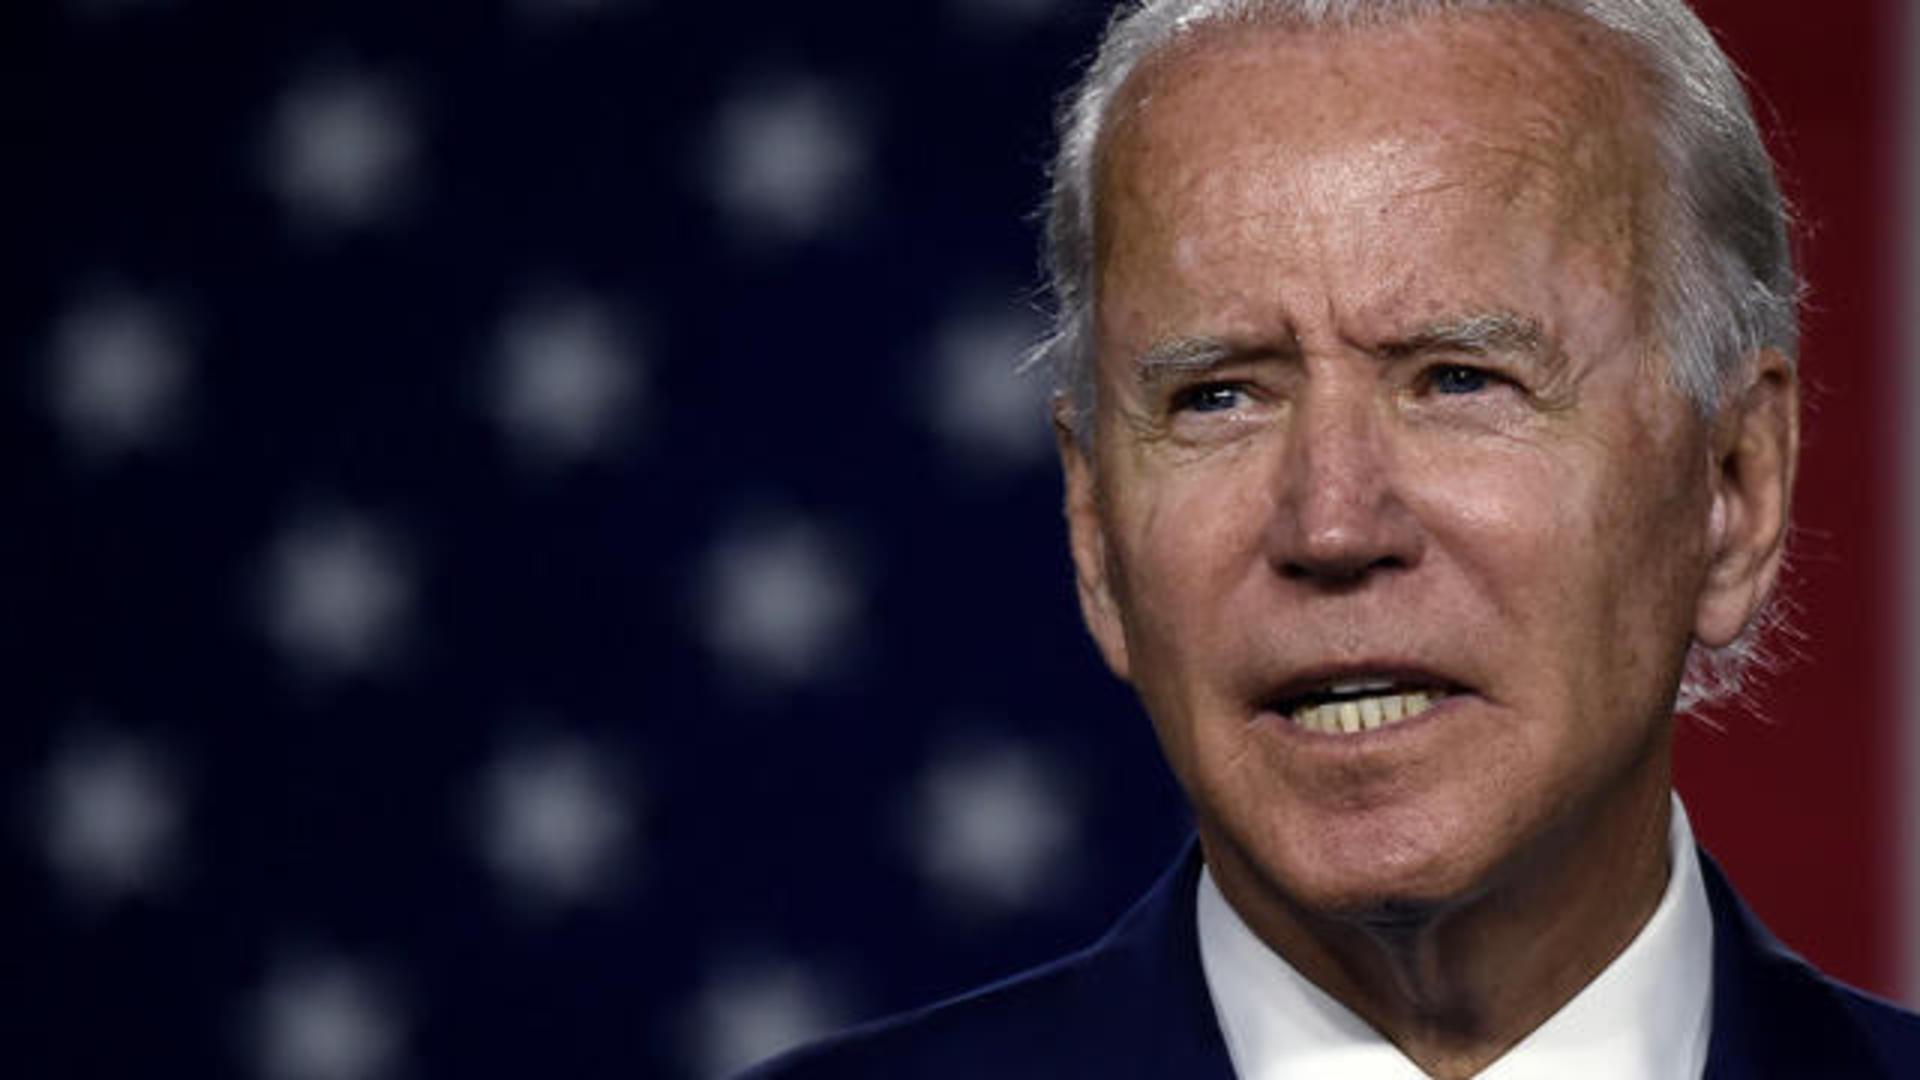 Biden S Campaign Responds After Twitter Account Hacked Cbs News